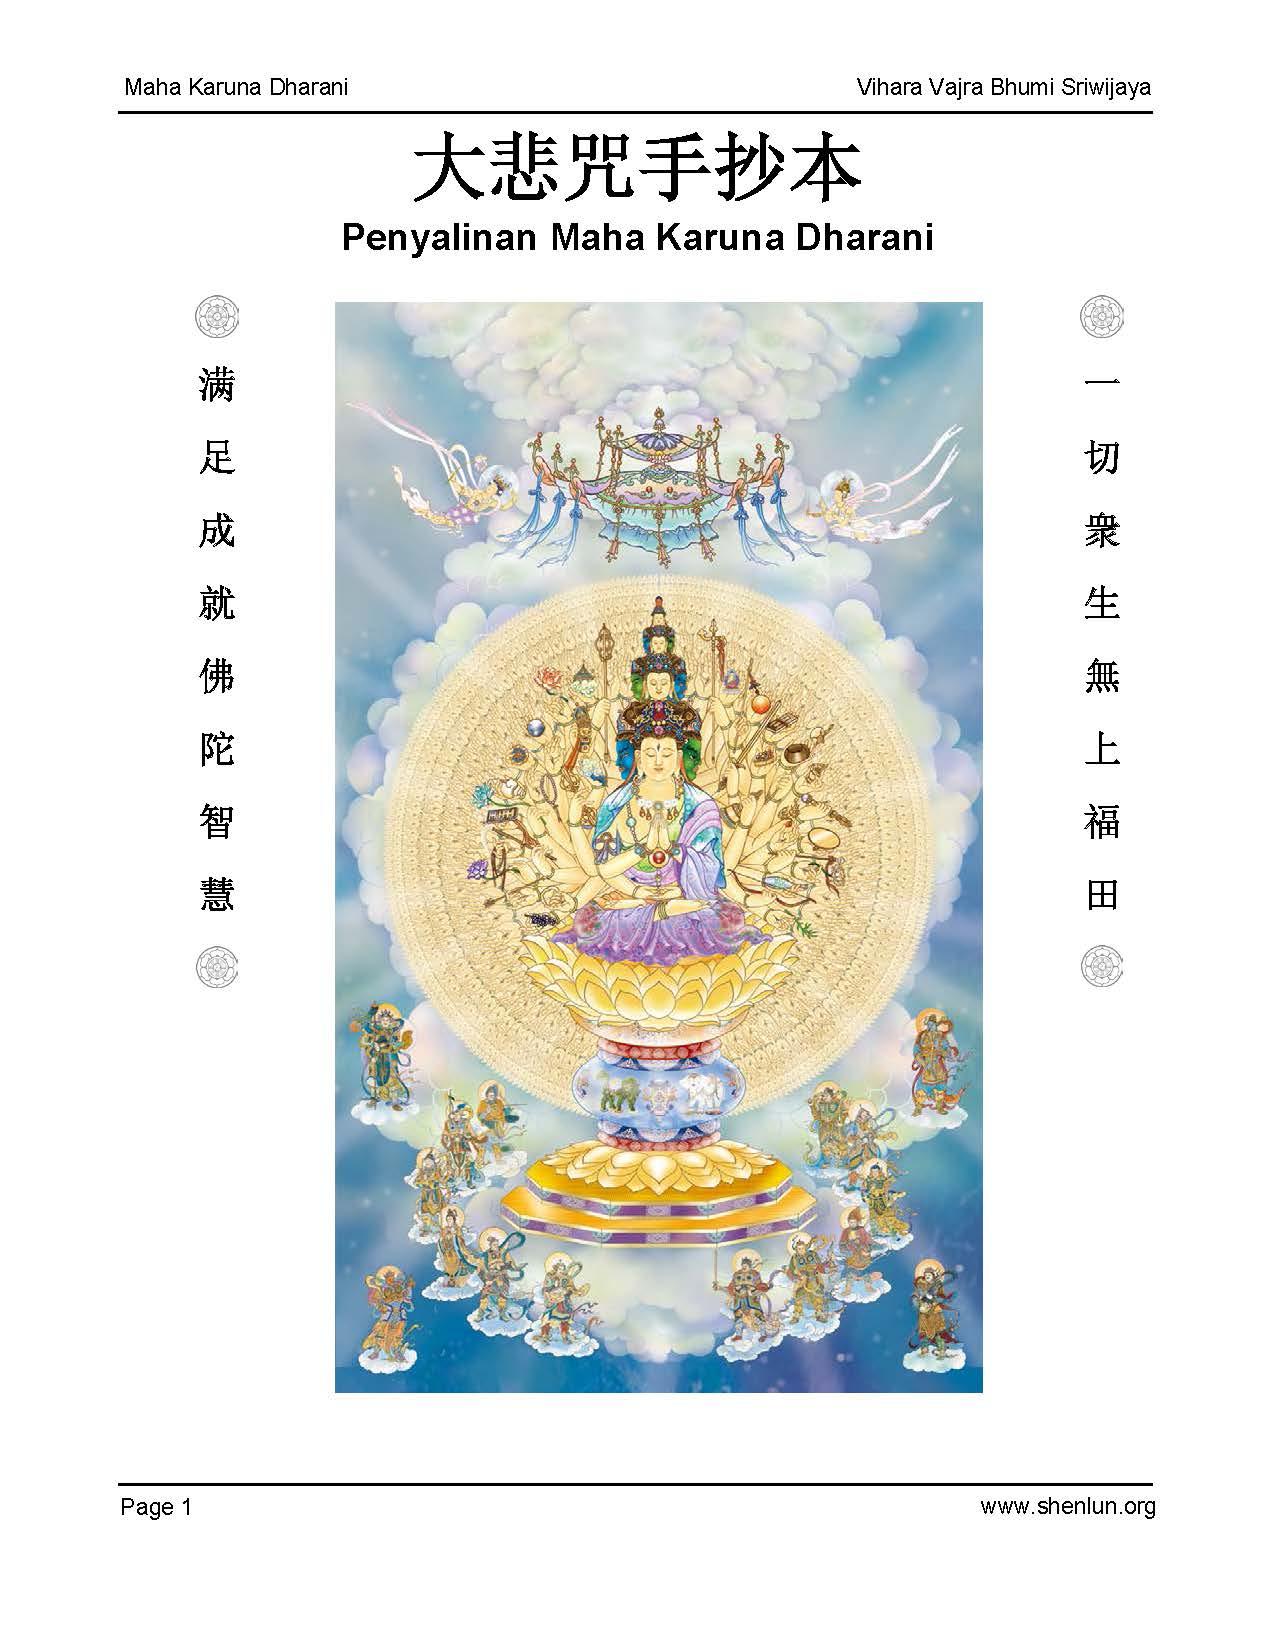 Penyalinan Maha Karuna Dharani